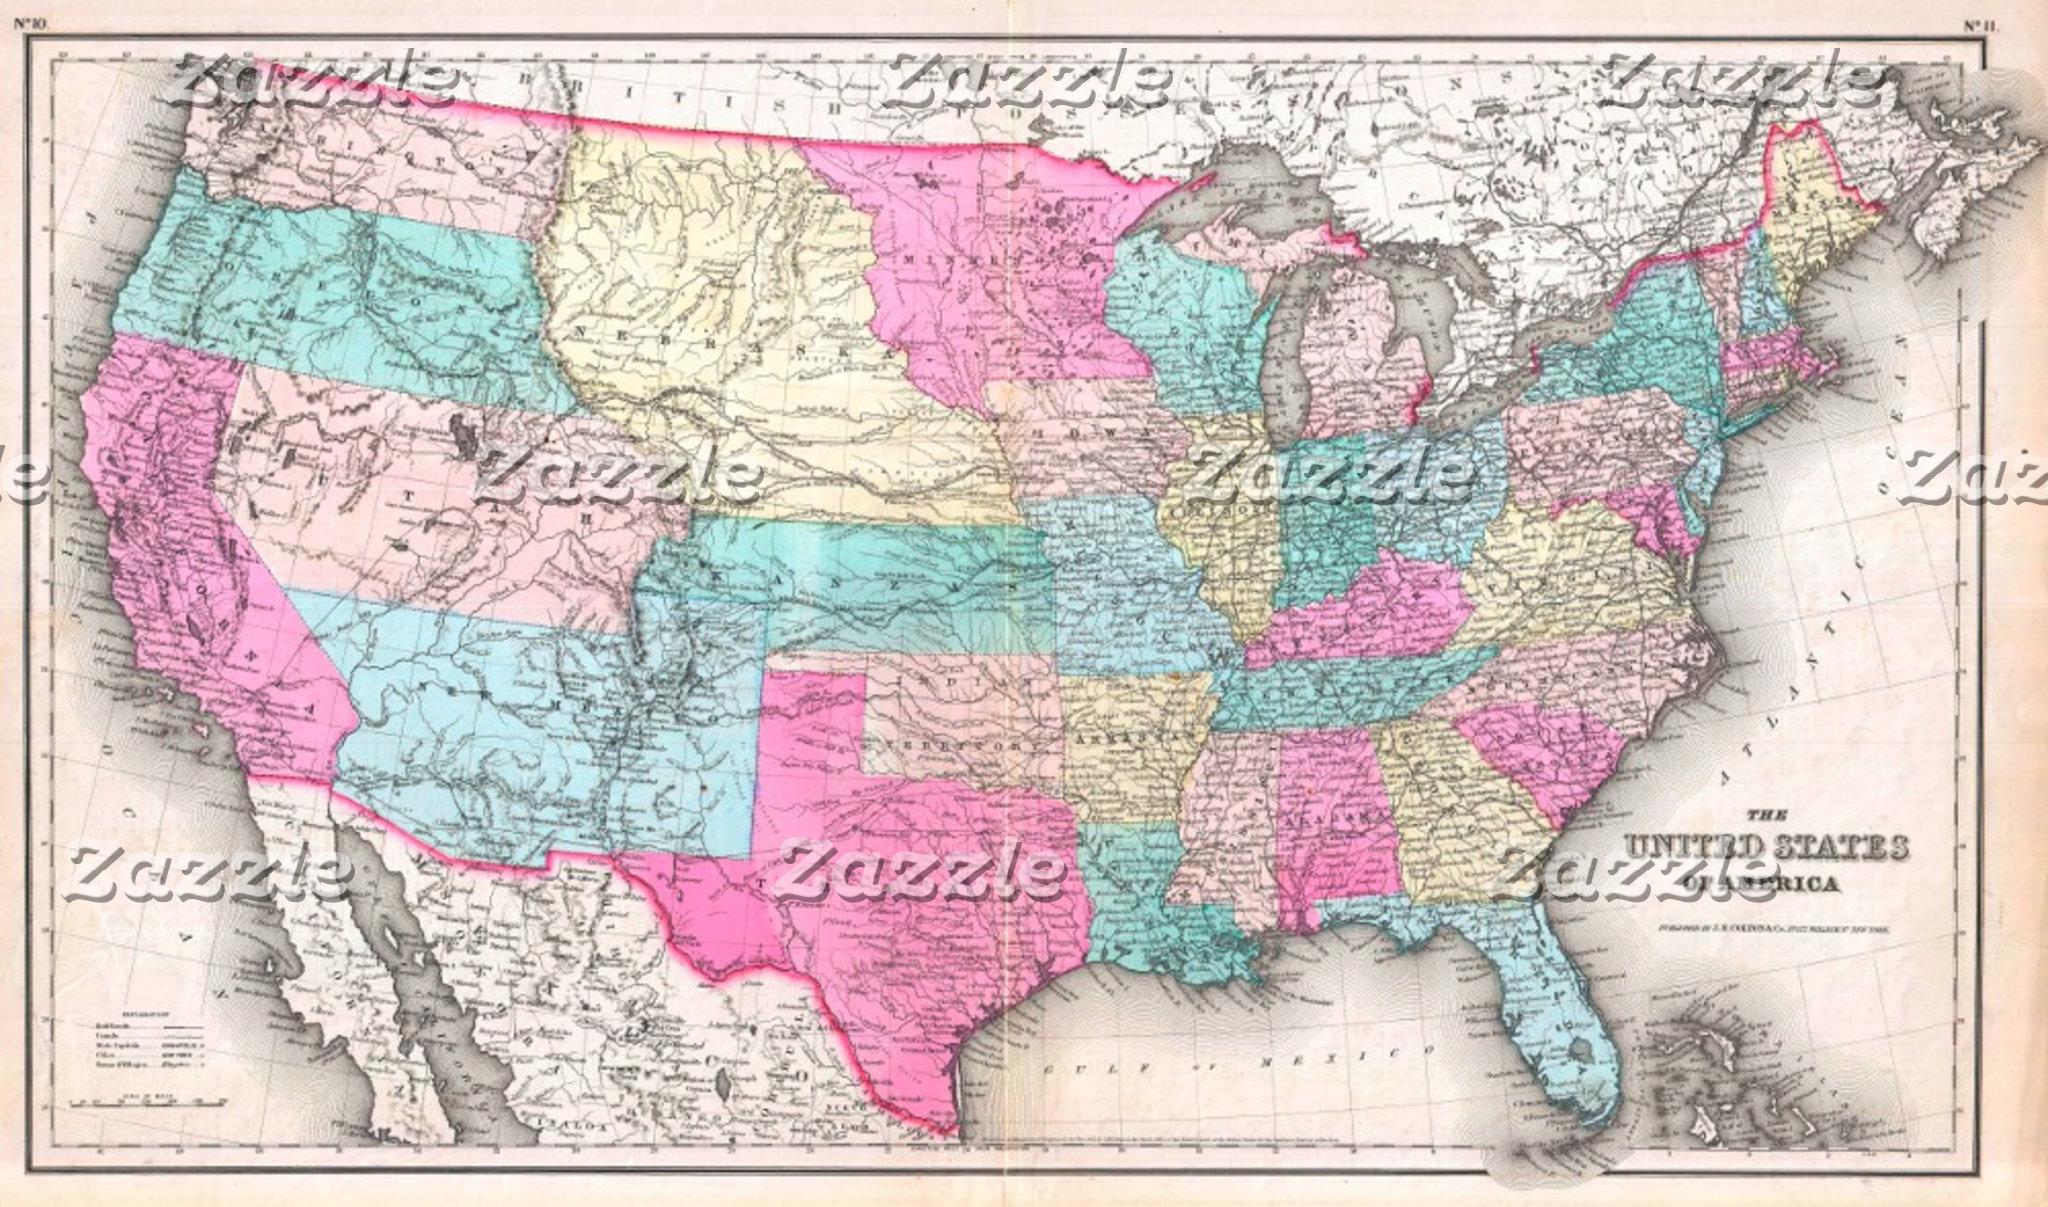 Vintage United States Map